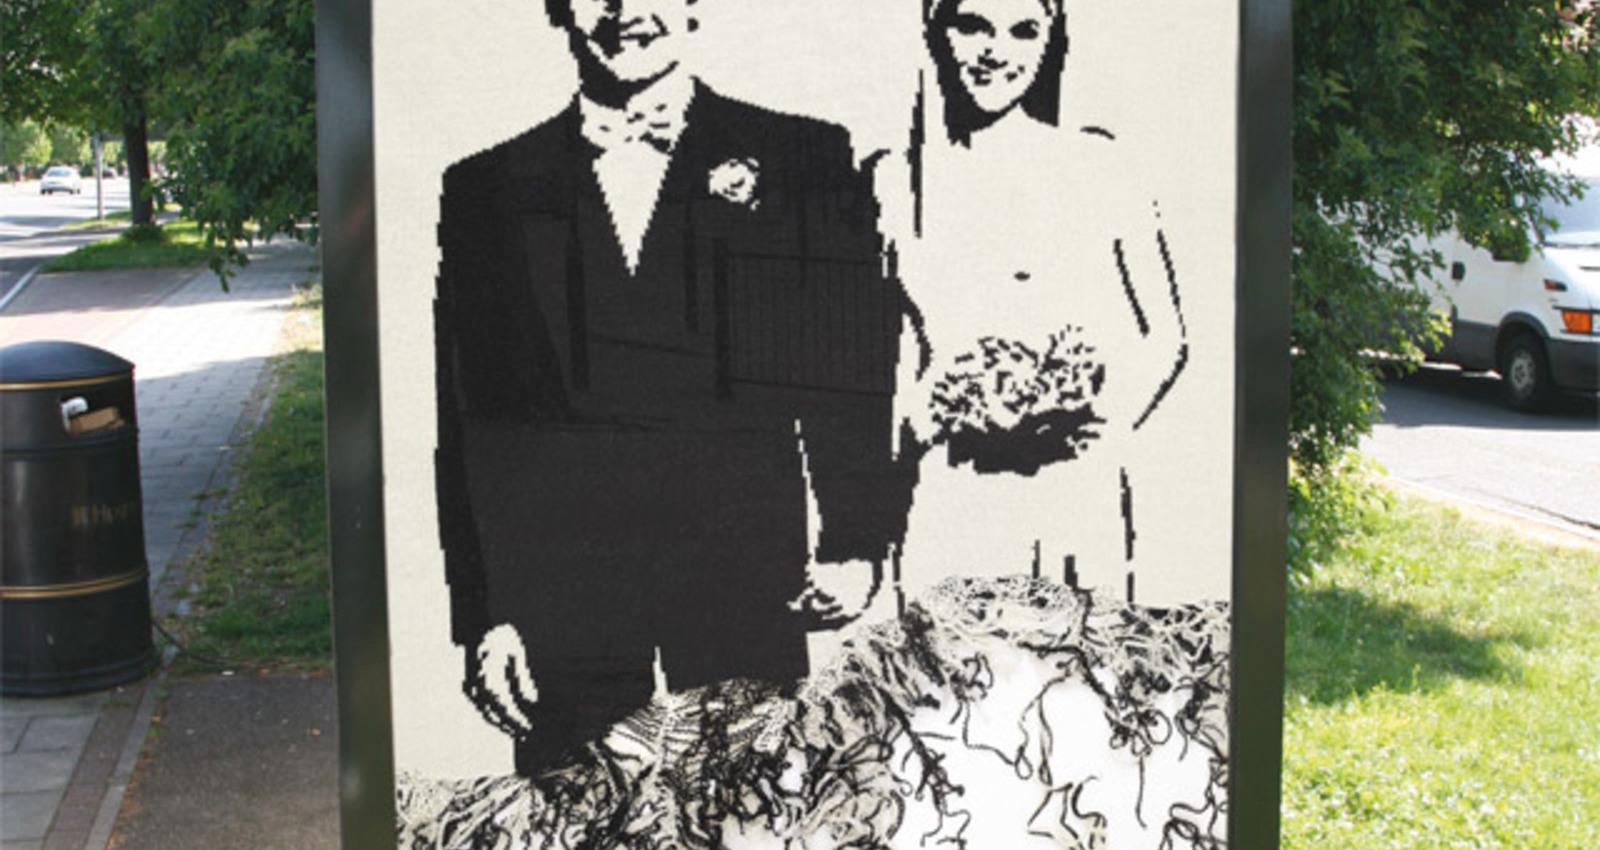 FALLING APART: MARRIAGE